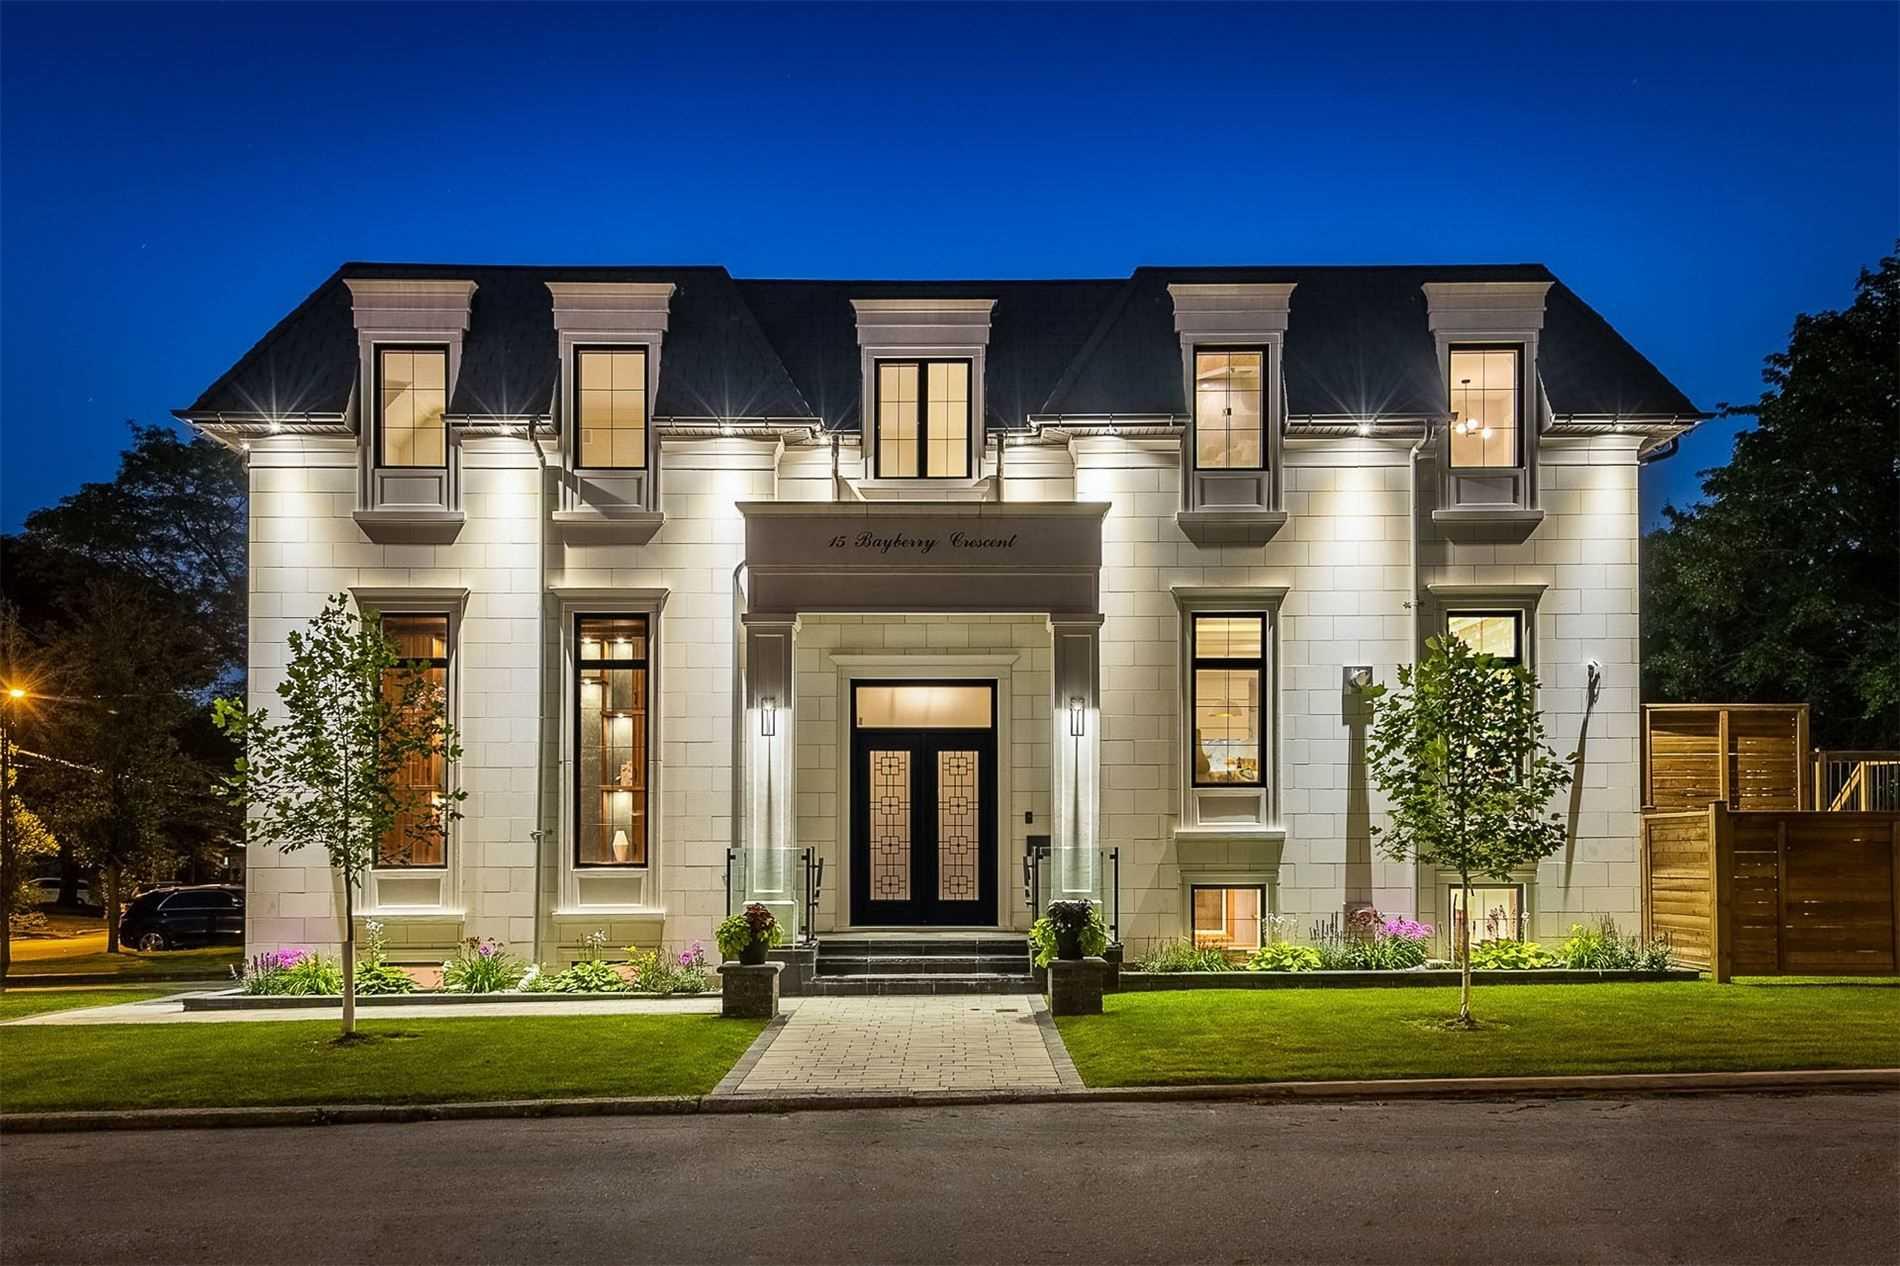 15 Bayberry Cres, Toronto, Ontario M2K1T9, 4 Bedrooms Bedrooms, 12 Rooms Rooms,6 BathroomsBathrooms,Detached,For Sale,Bayberry,C5320392